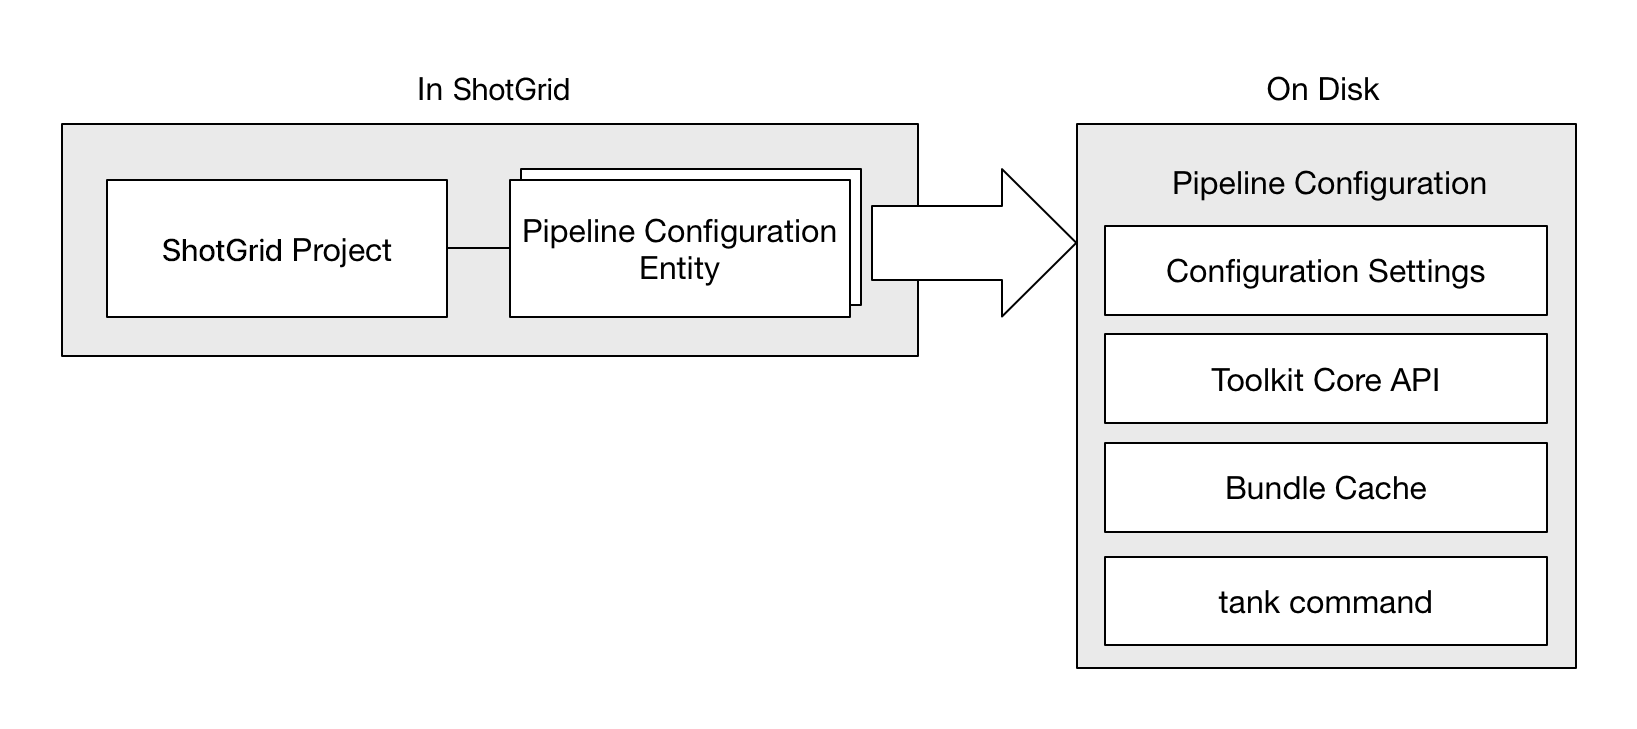 Initialization and startup — tk-core v0 18 167 documentation